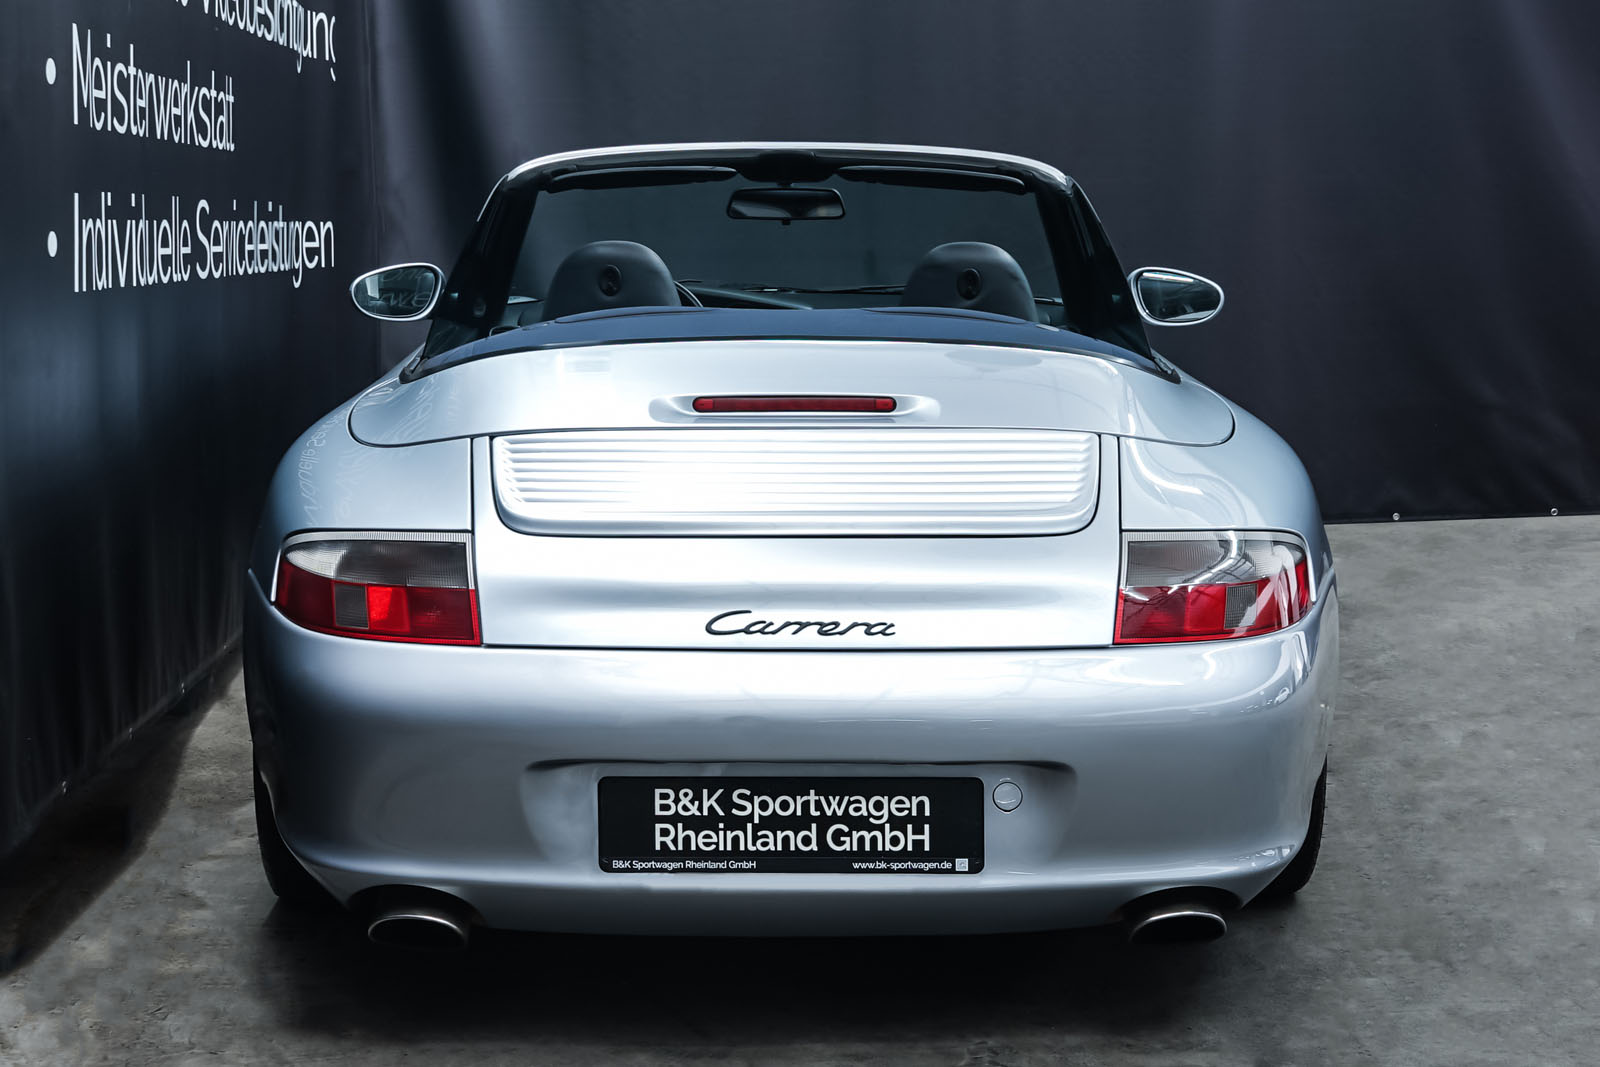 Porsche_996_Cabrio_Silber_Dunkelblau_POR-1724_16_w